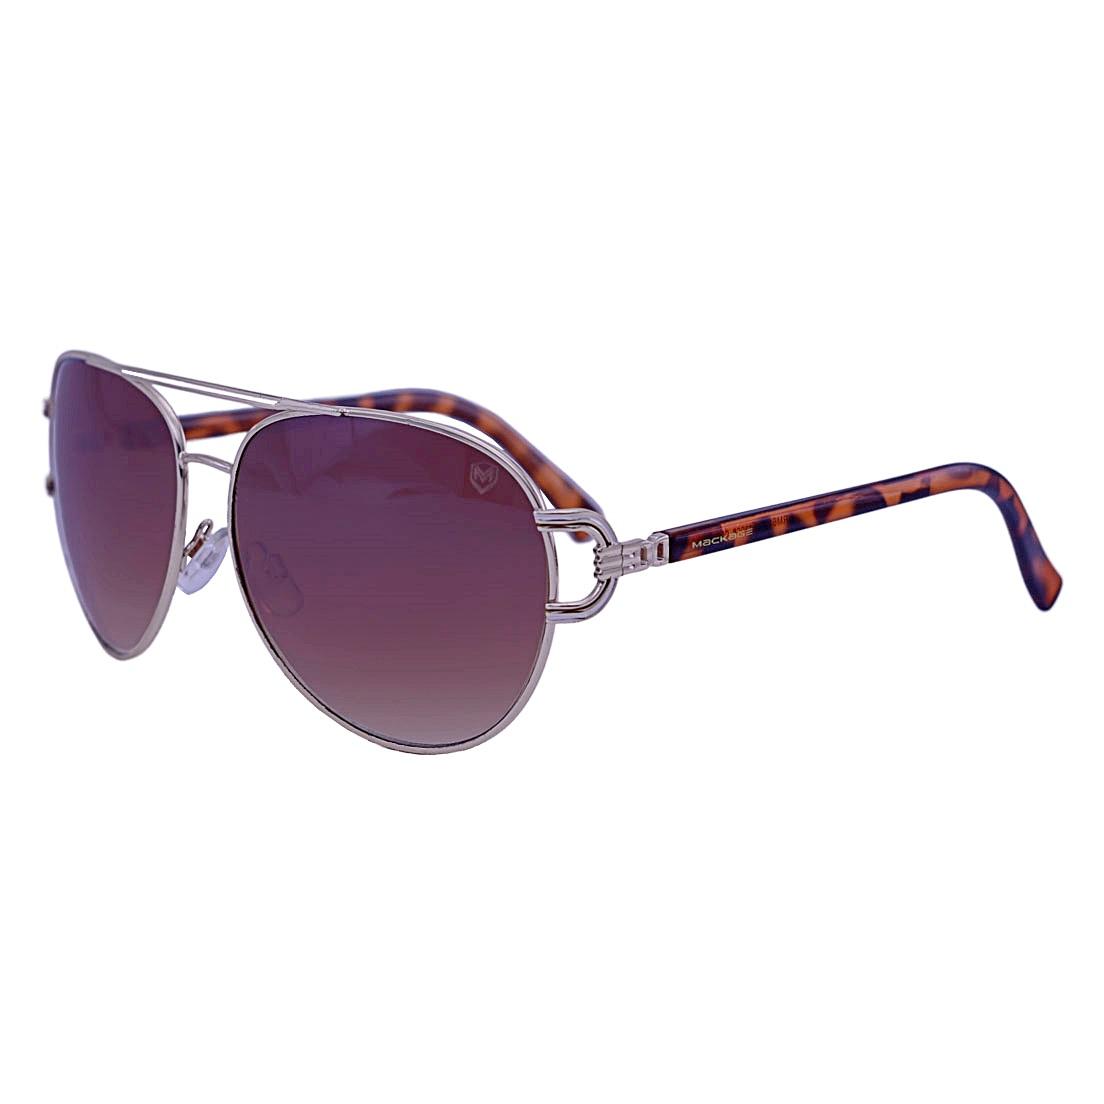 Óculos de Sol Mackage Feminino Metal/Acetato Aviator - Dourado/Tarta